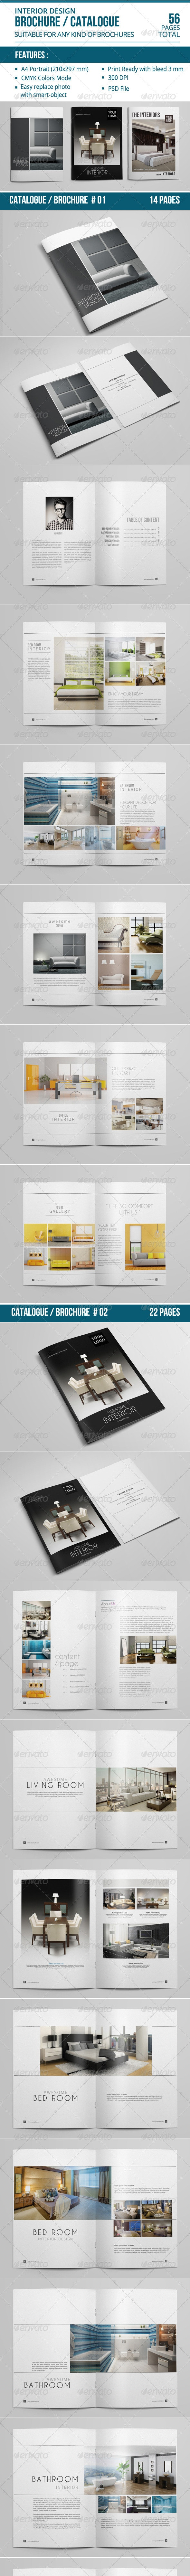 Catalogue / Brochure Bundle Vol. 01 - Catalogs Brochures